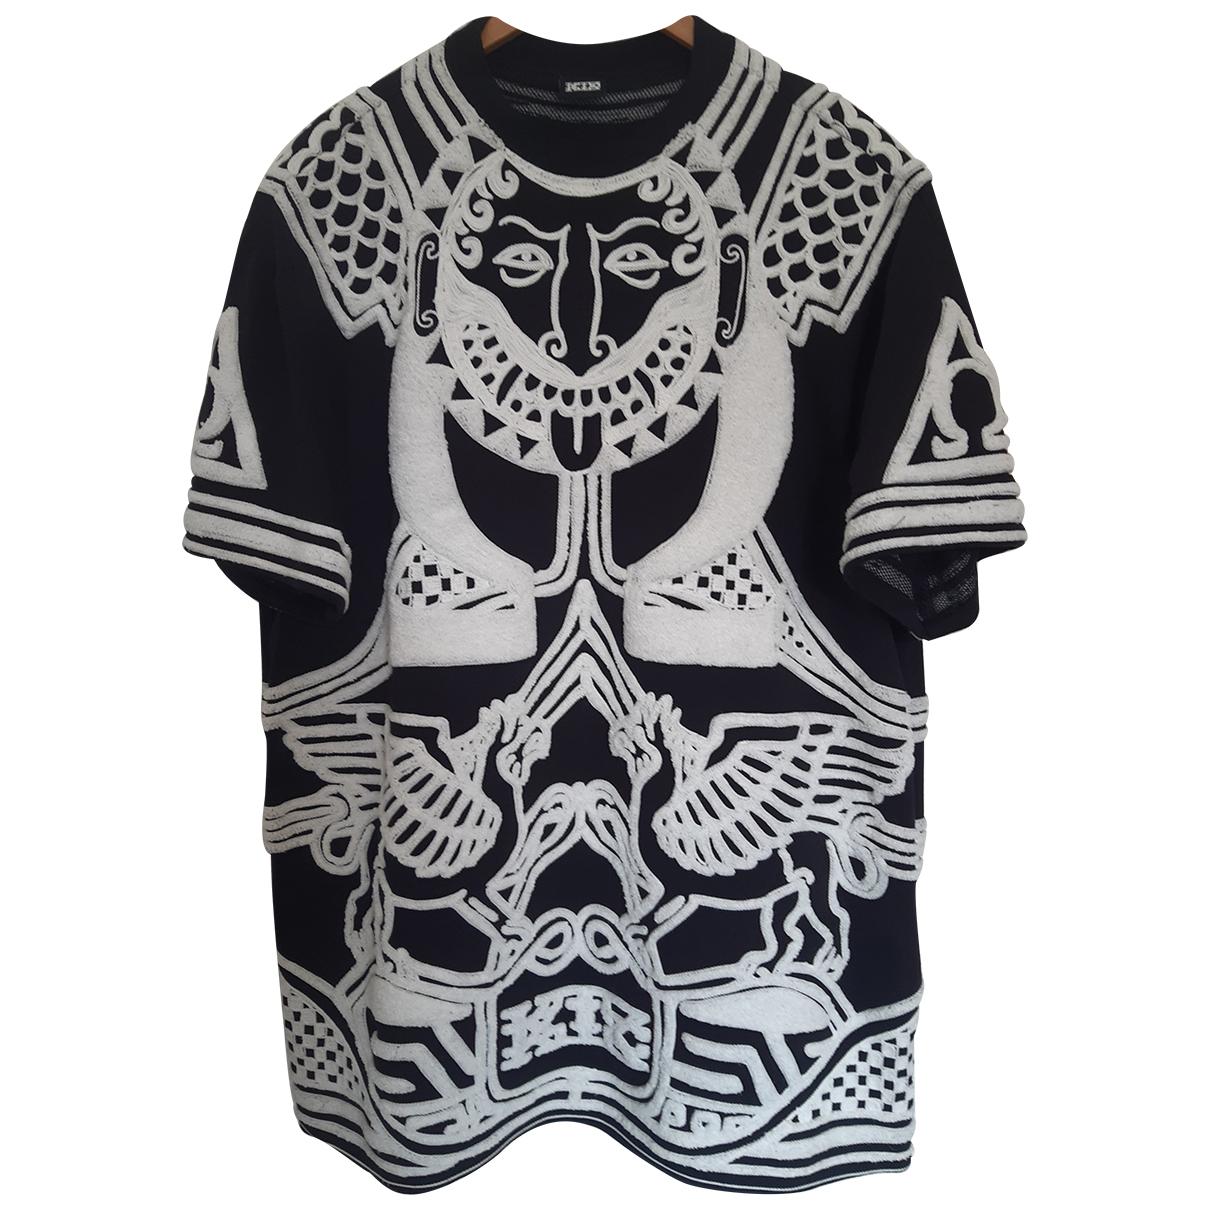 Ktz \N Black T-shirts for Men S International